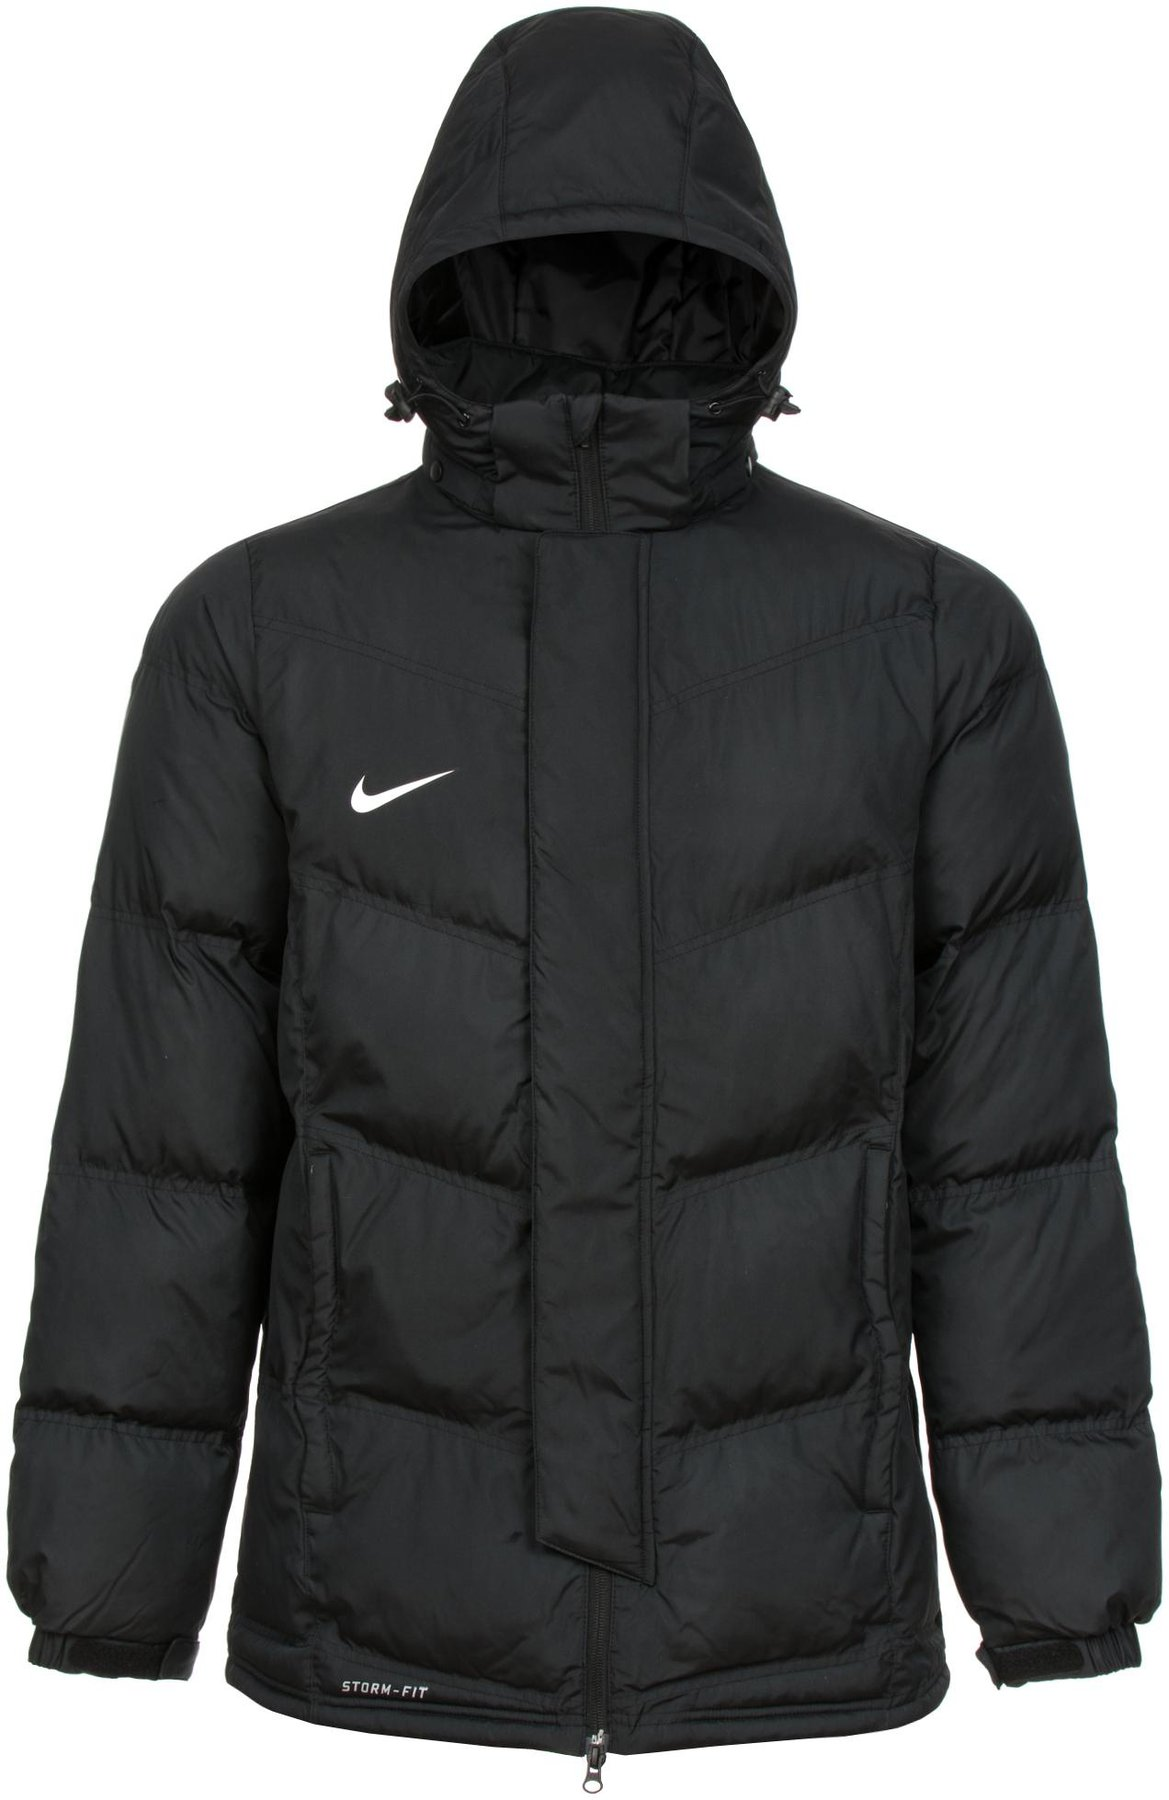 47777b1c886c90 Nike Winterjacke Herren günstig online bei Preis.de bestellen✓